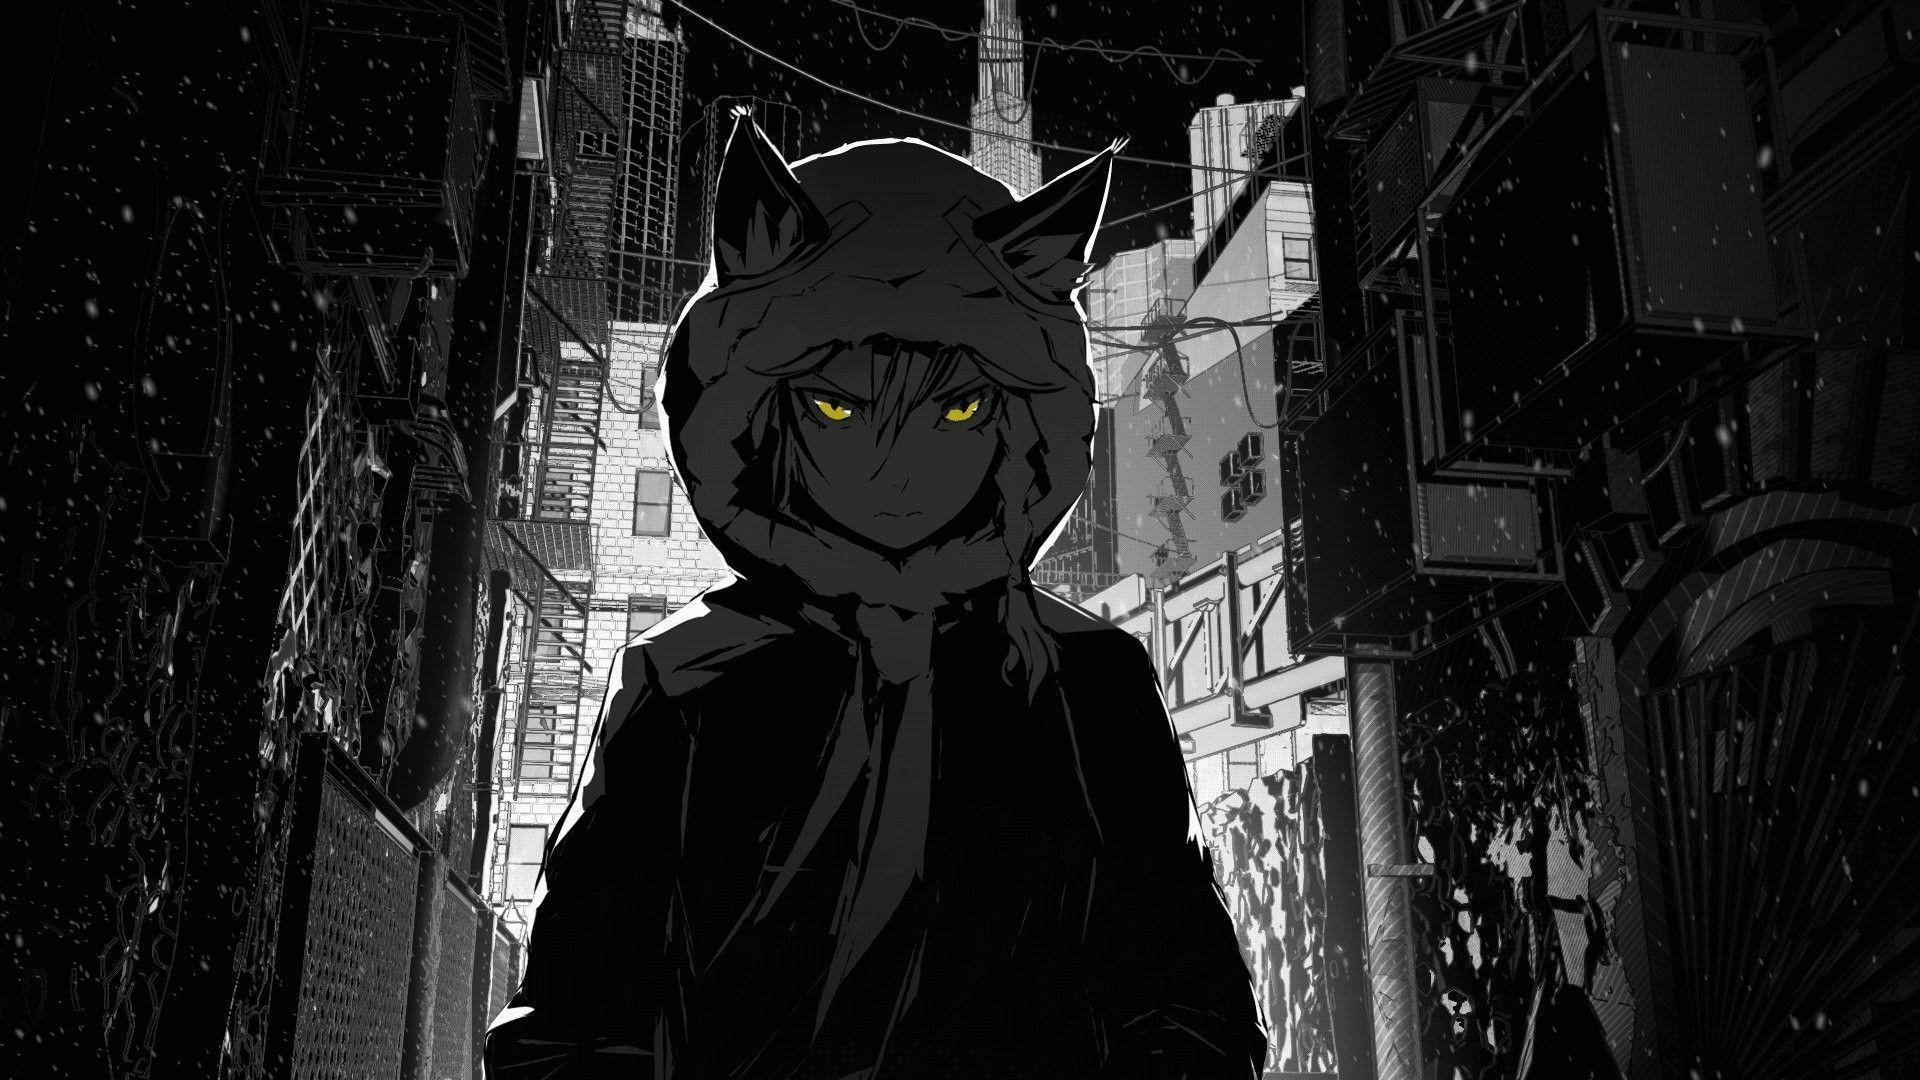 Black Aesthetic Anime Desktop Wallpapers Wallpaper Cave